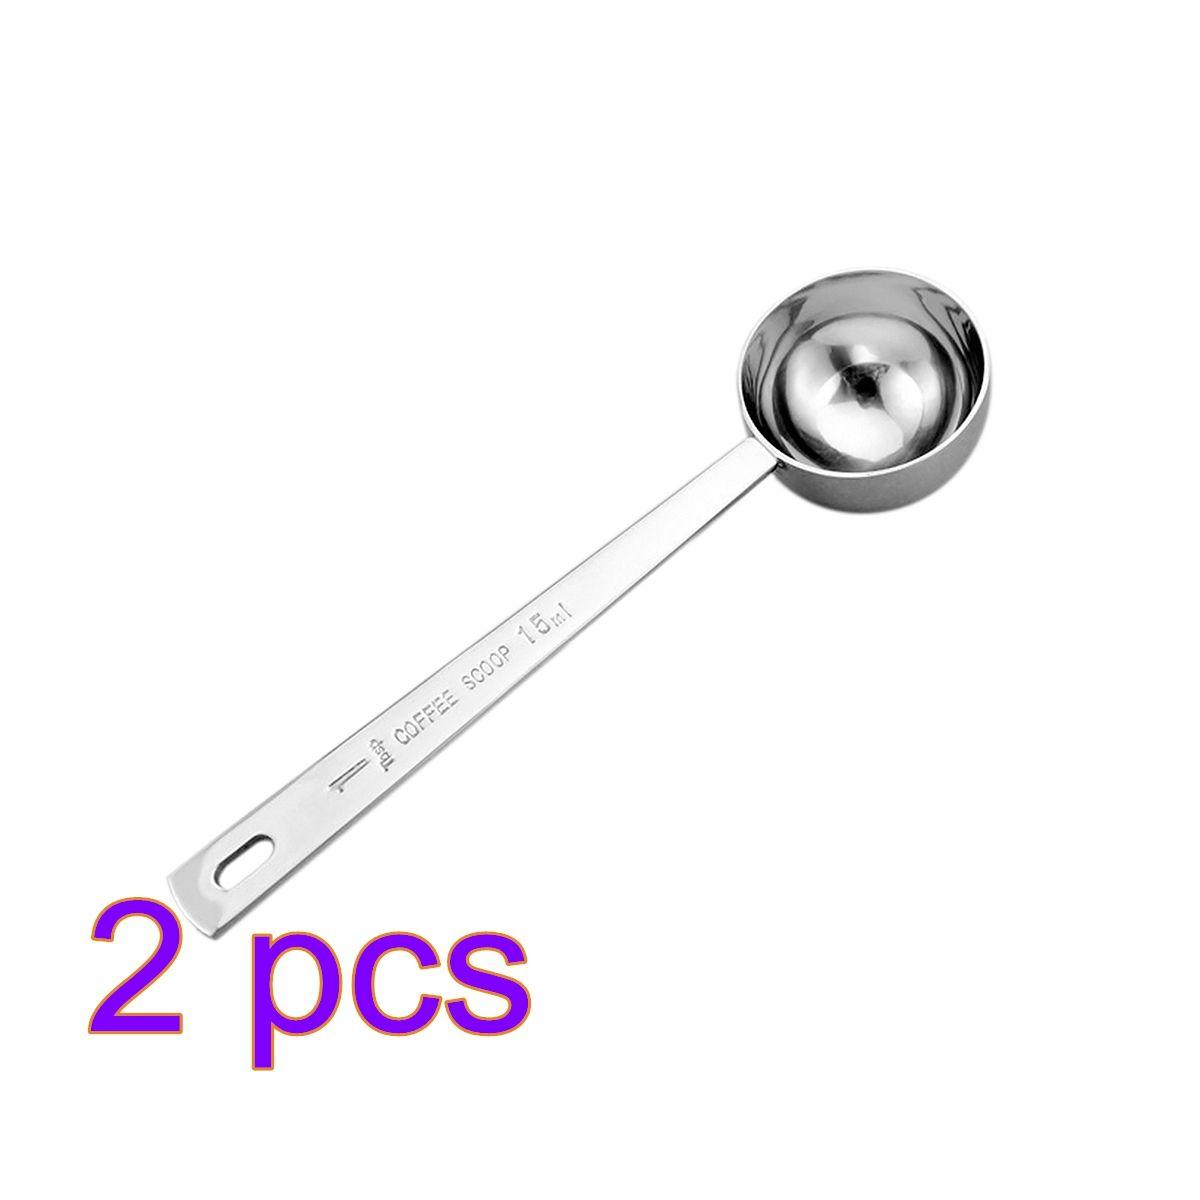 Set of 1 Stainless Steel 1 Tablespoon Measuring Coffee Scoop Spoon